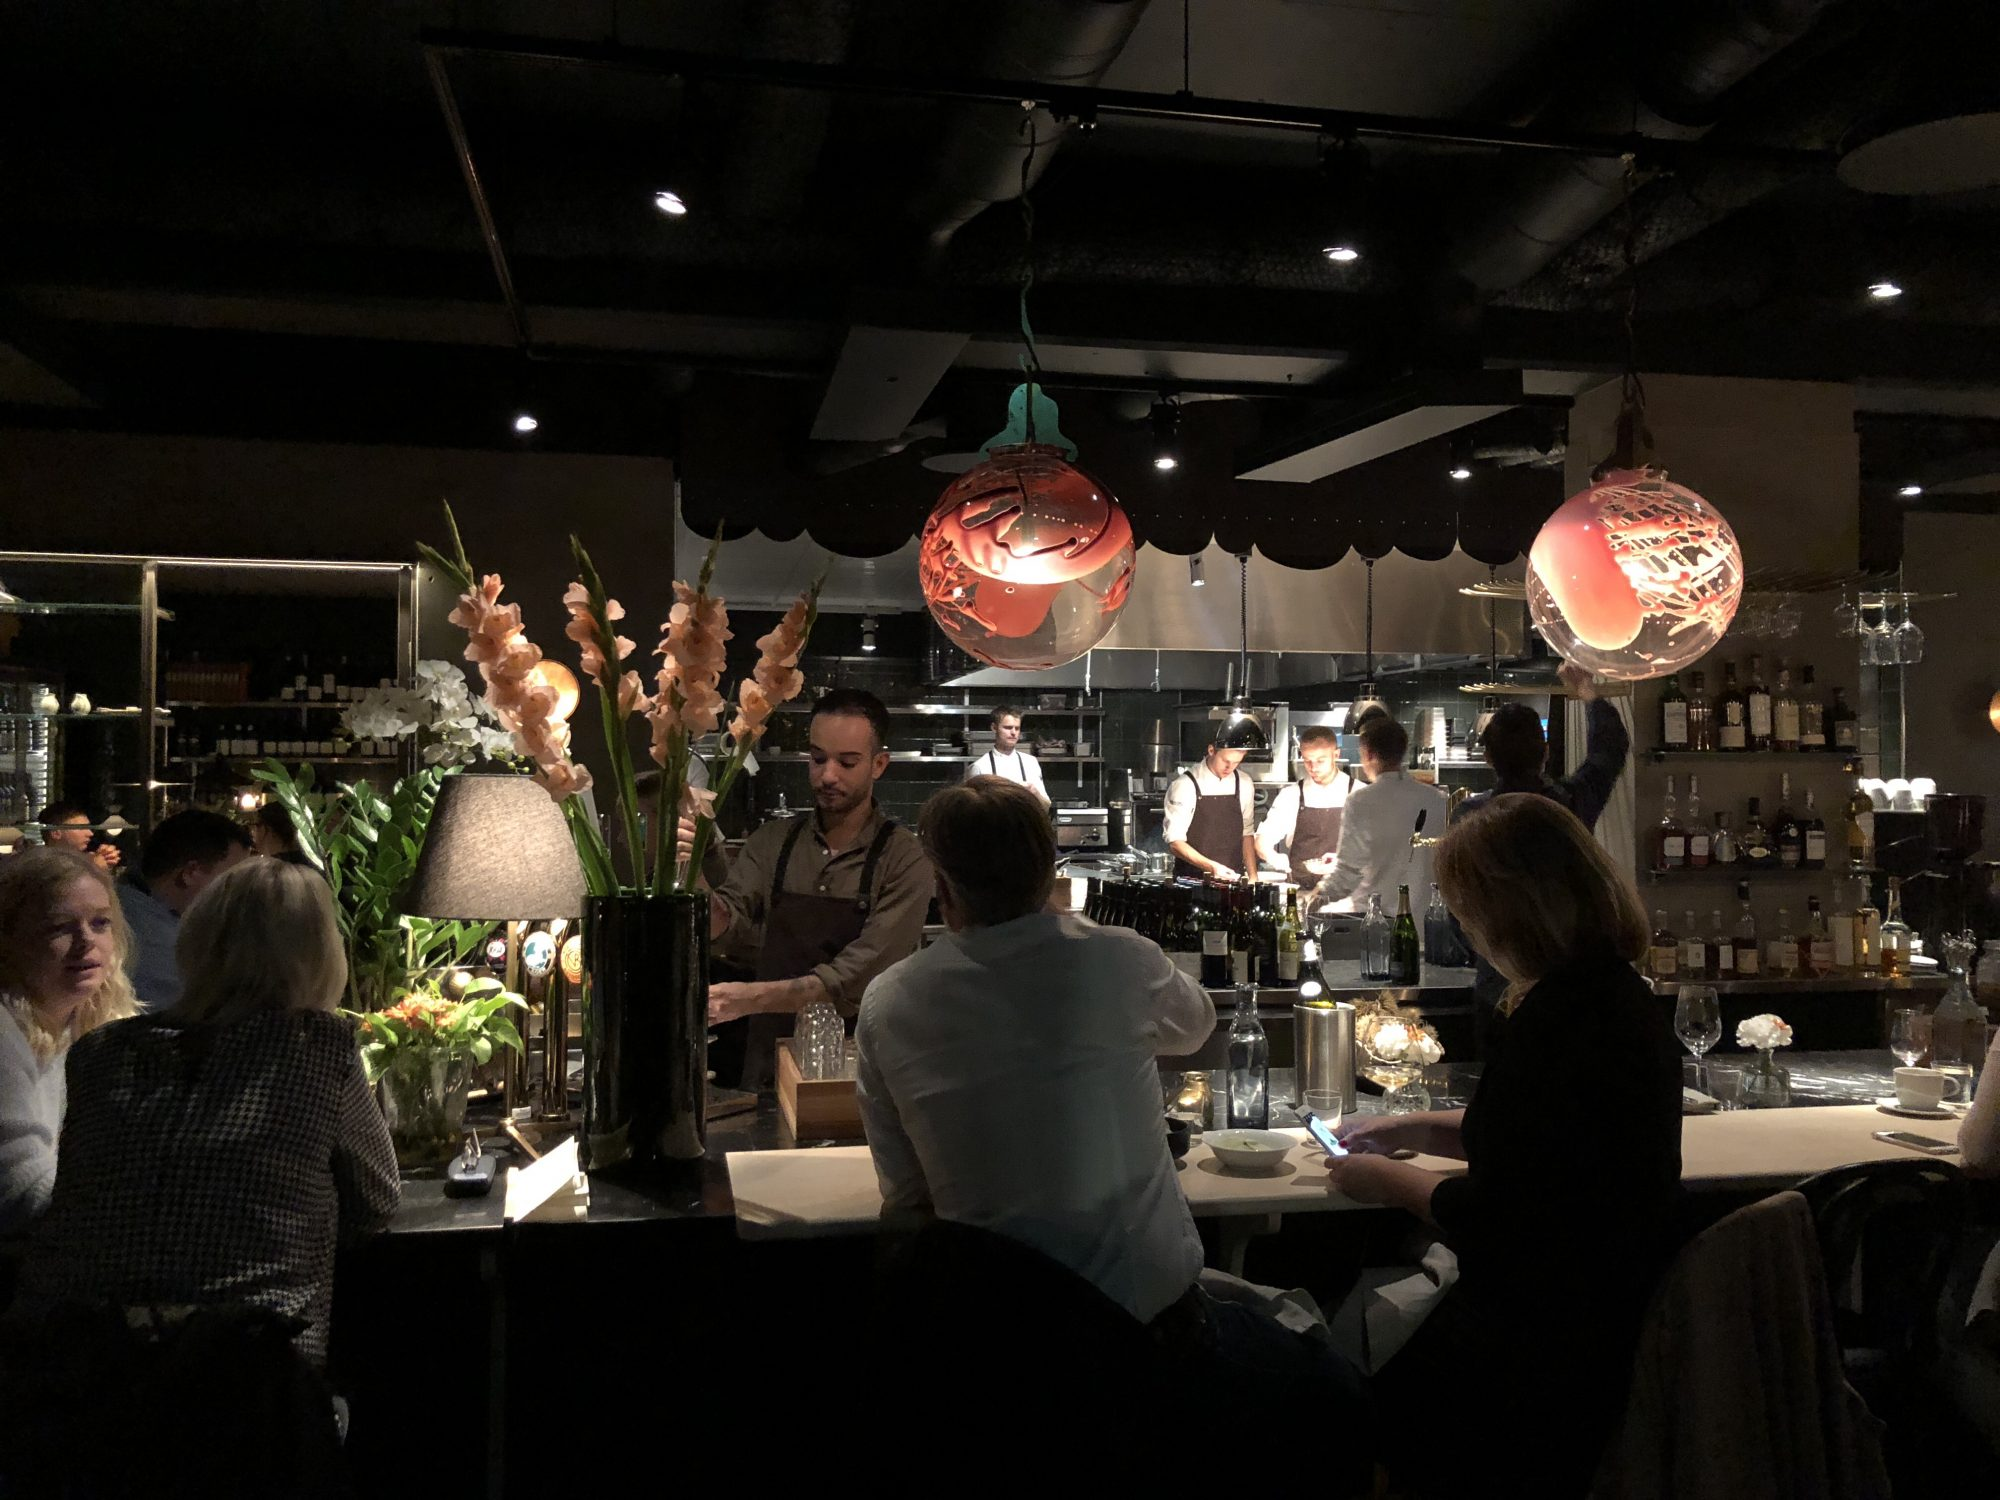 Restaurang Allegrine - Danyel Couets nya restaurang